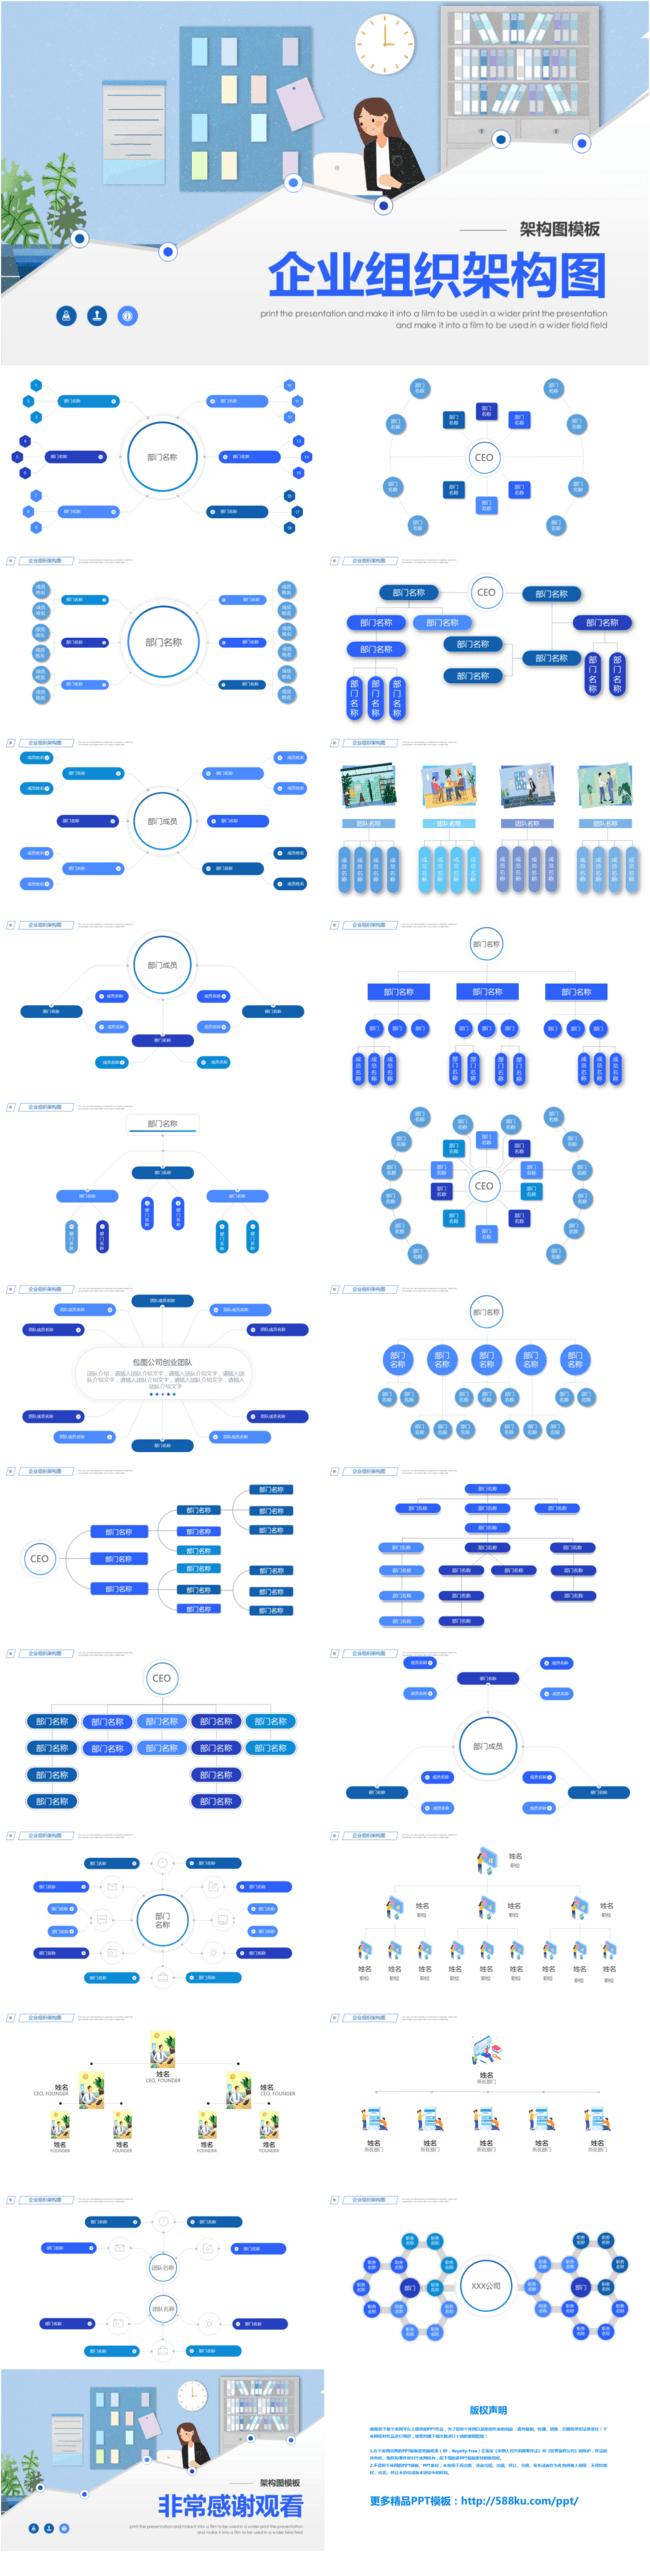 Business Enterprise Organization Chart Diagram Ppt Template Powerpoint Templete Ppt Free Download 650052787 Lovepik Com